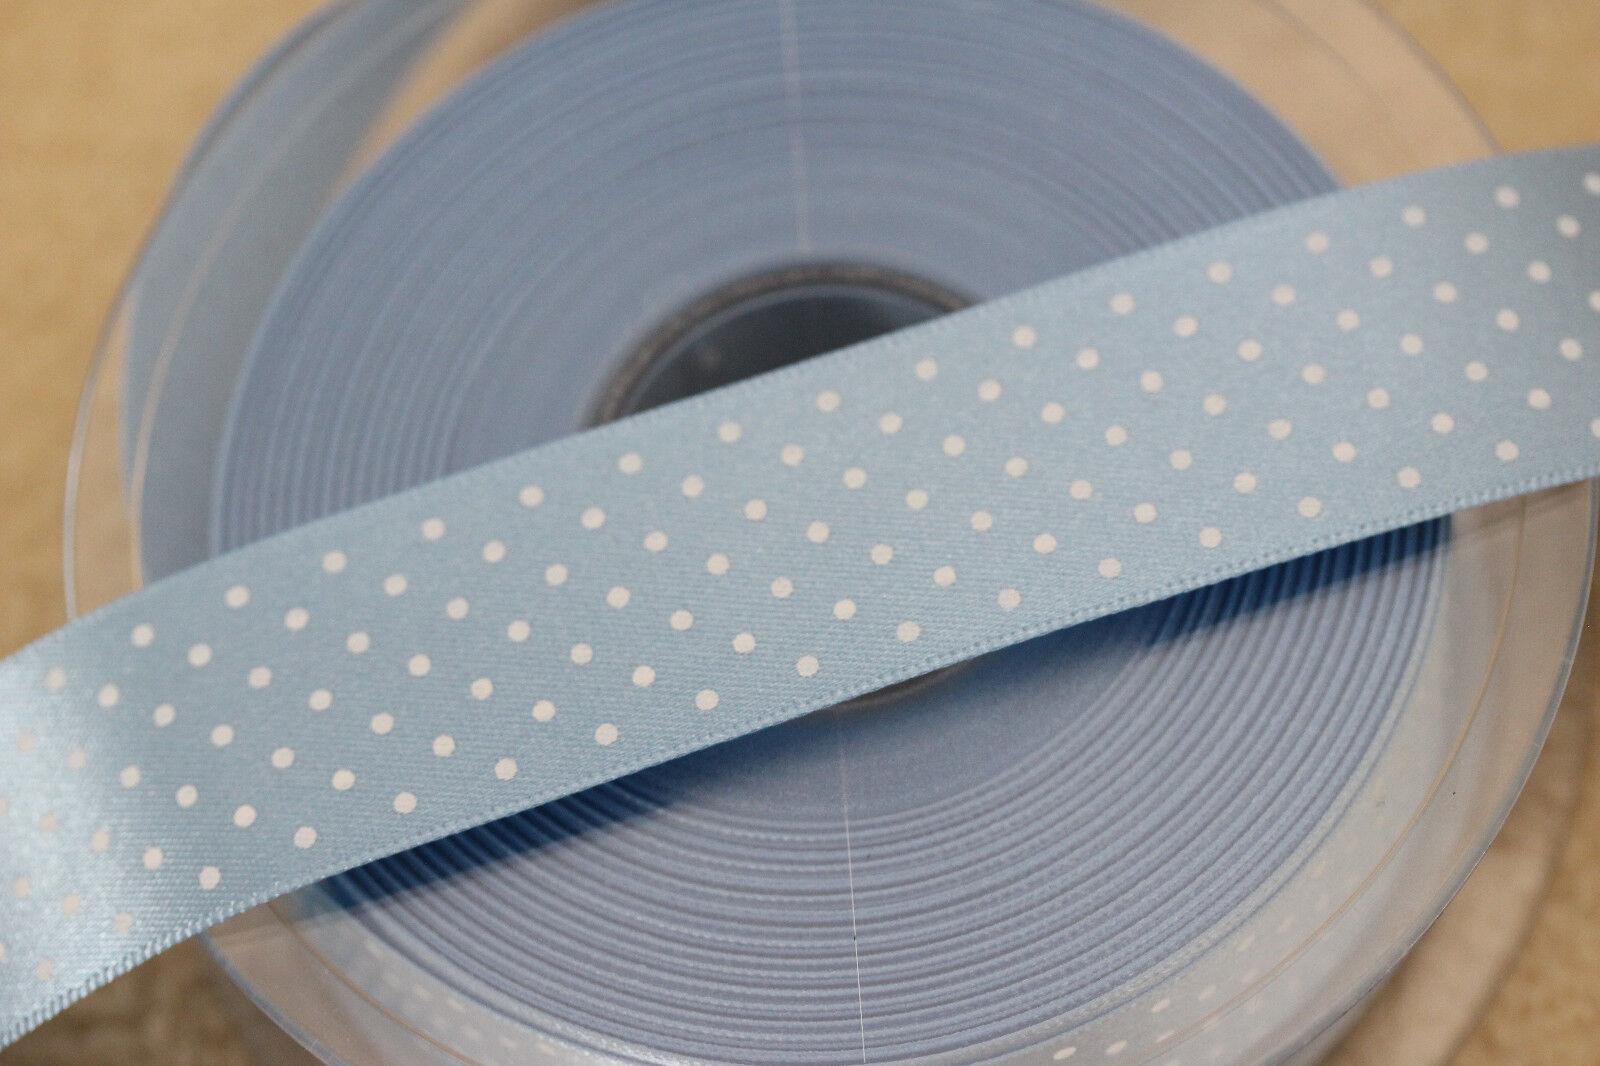 5932 #76 BABY BLUE Berisfords Satin Polka Micro Dot Spotty Ribbon 15mm